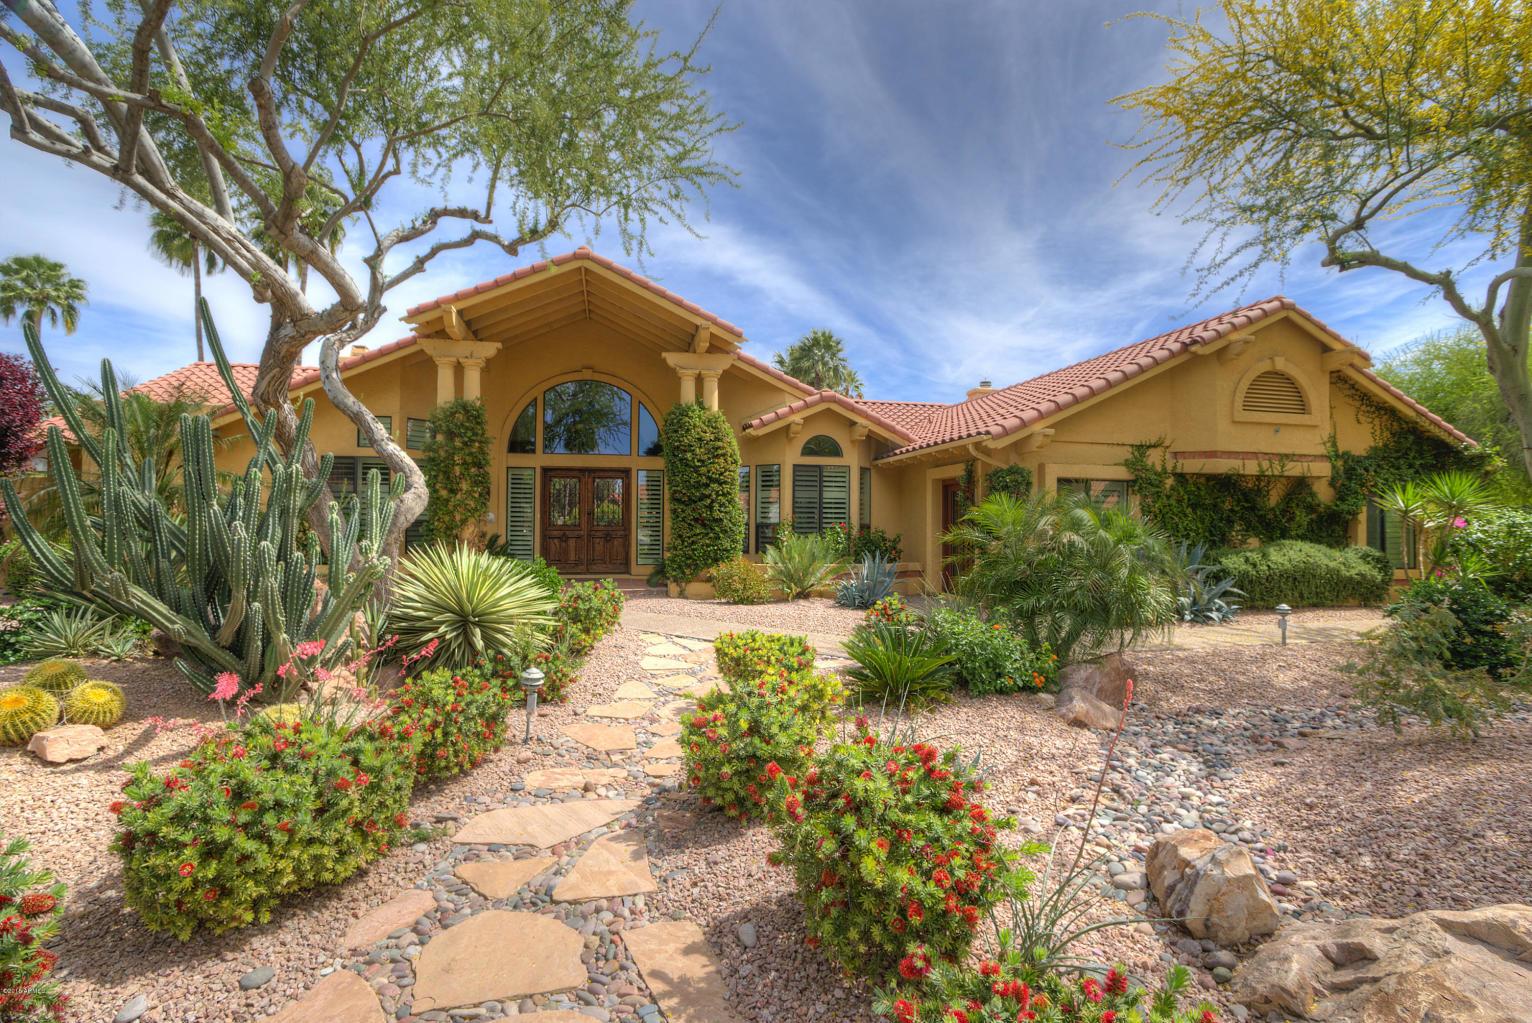 9862 E Doubletree Ranch Rd, Scottsdale | $800,000